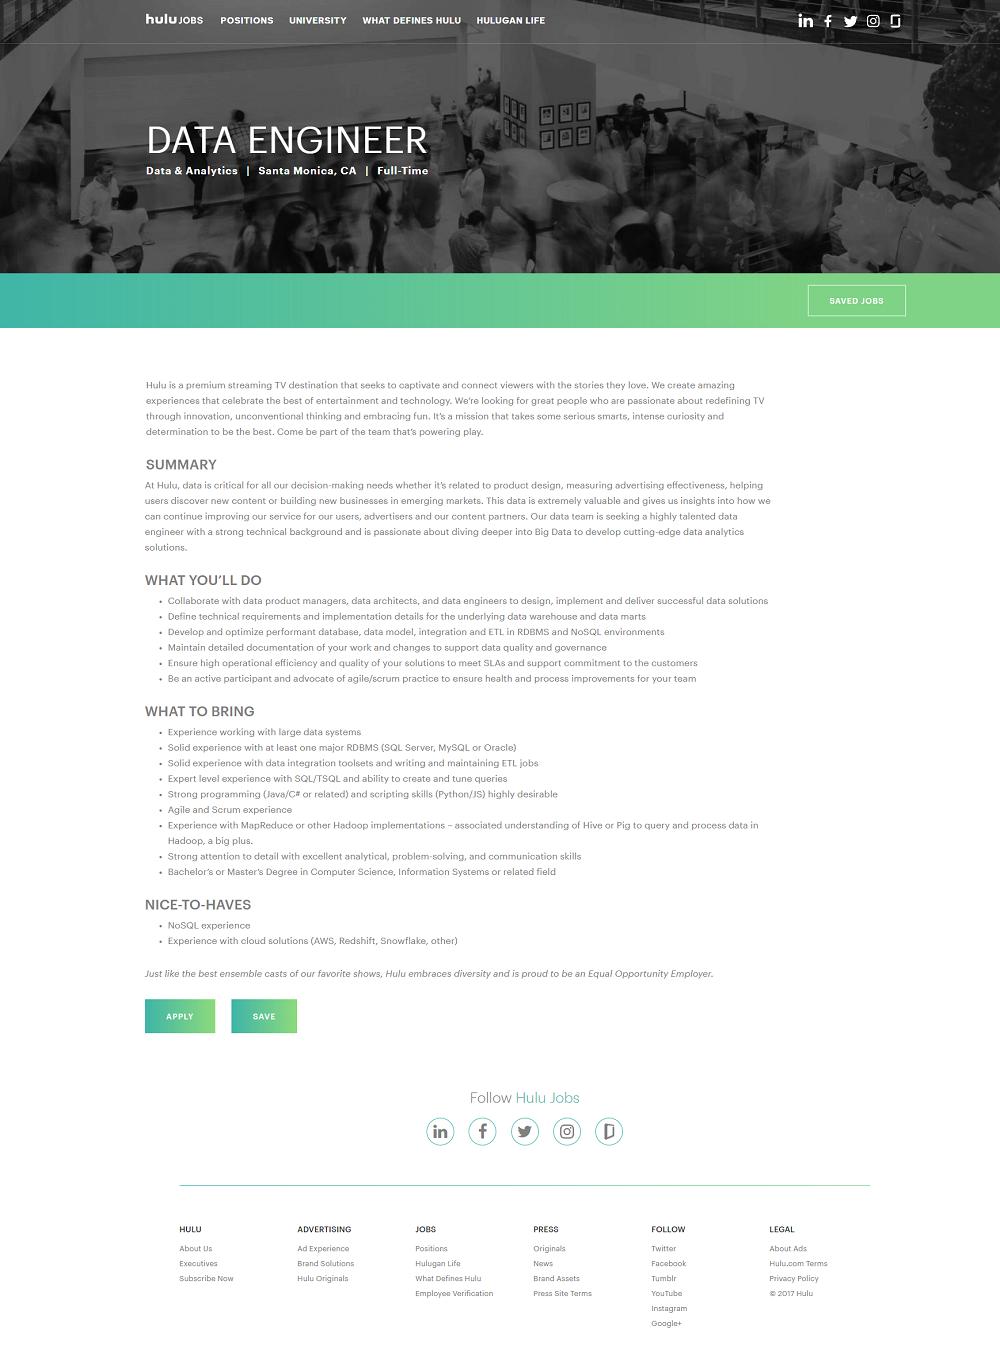 Hulu Jobvite ATS job page overlay